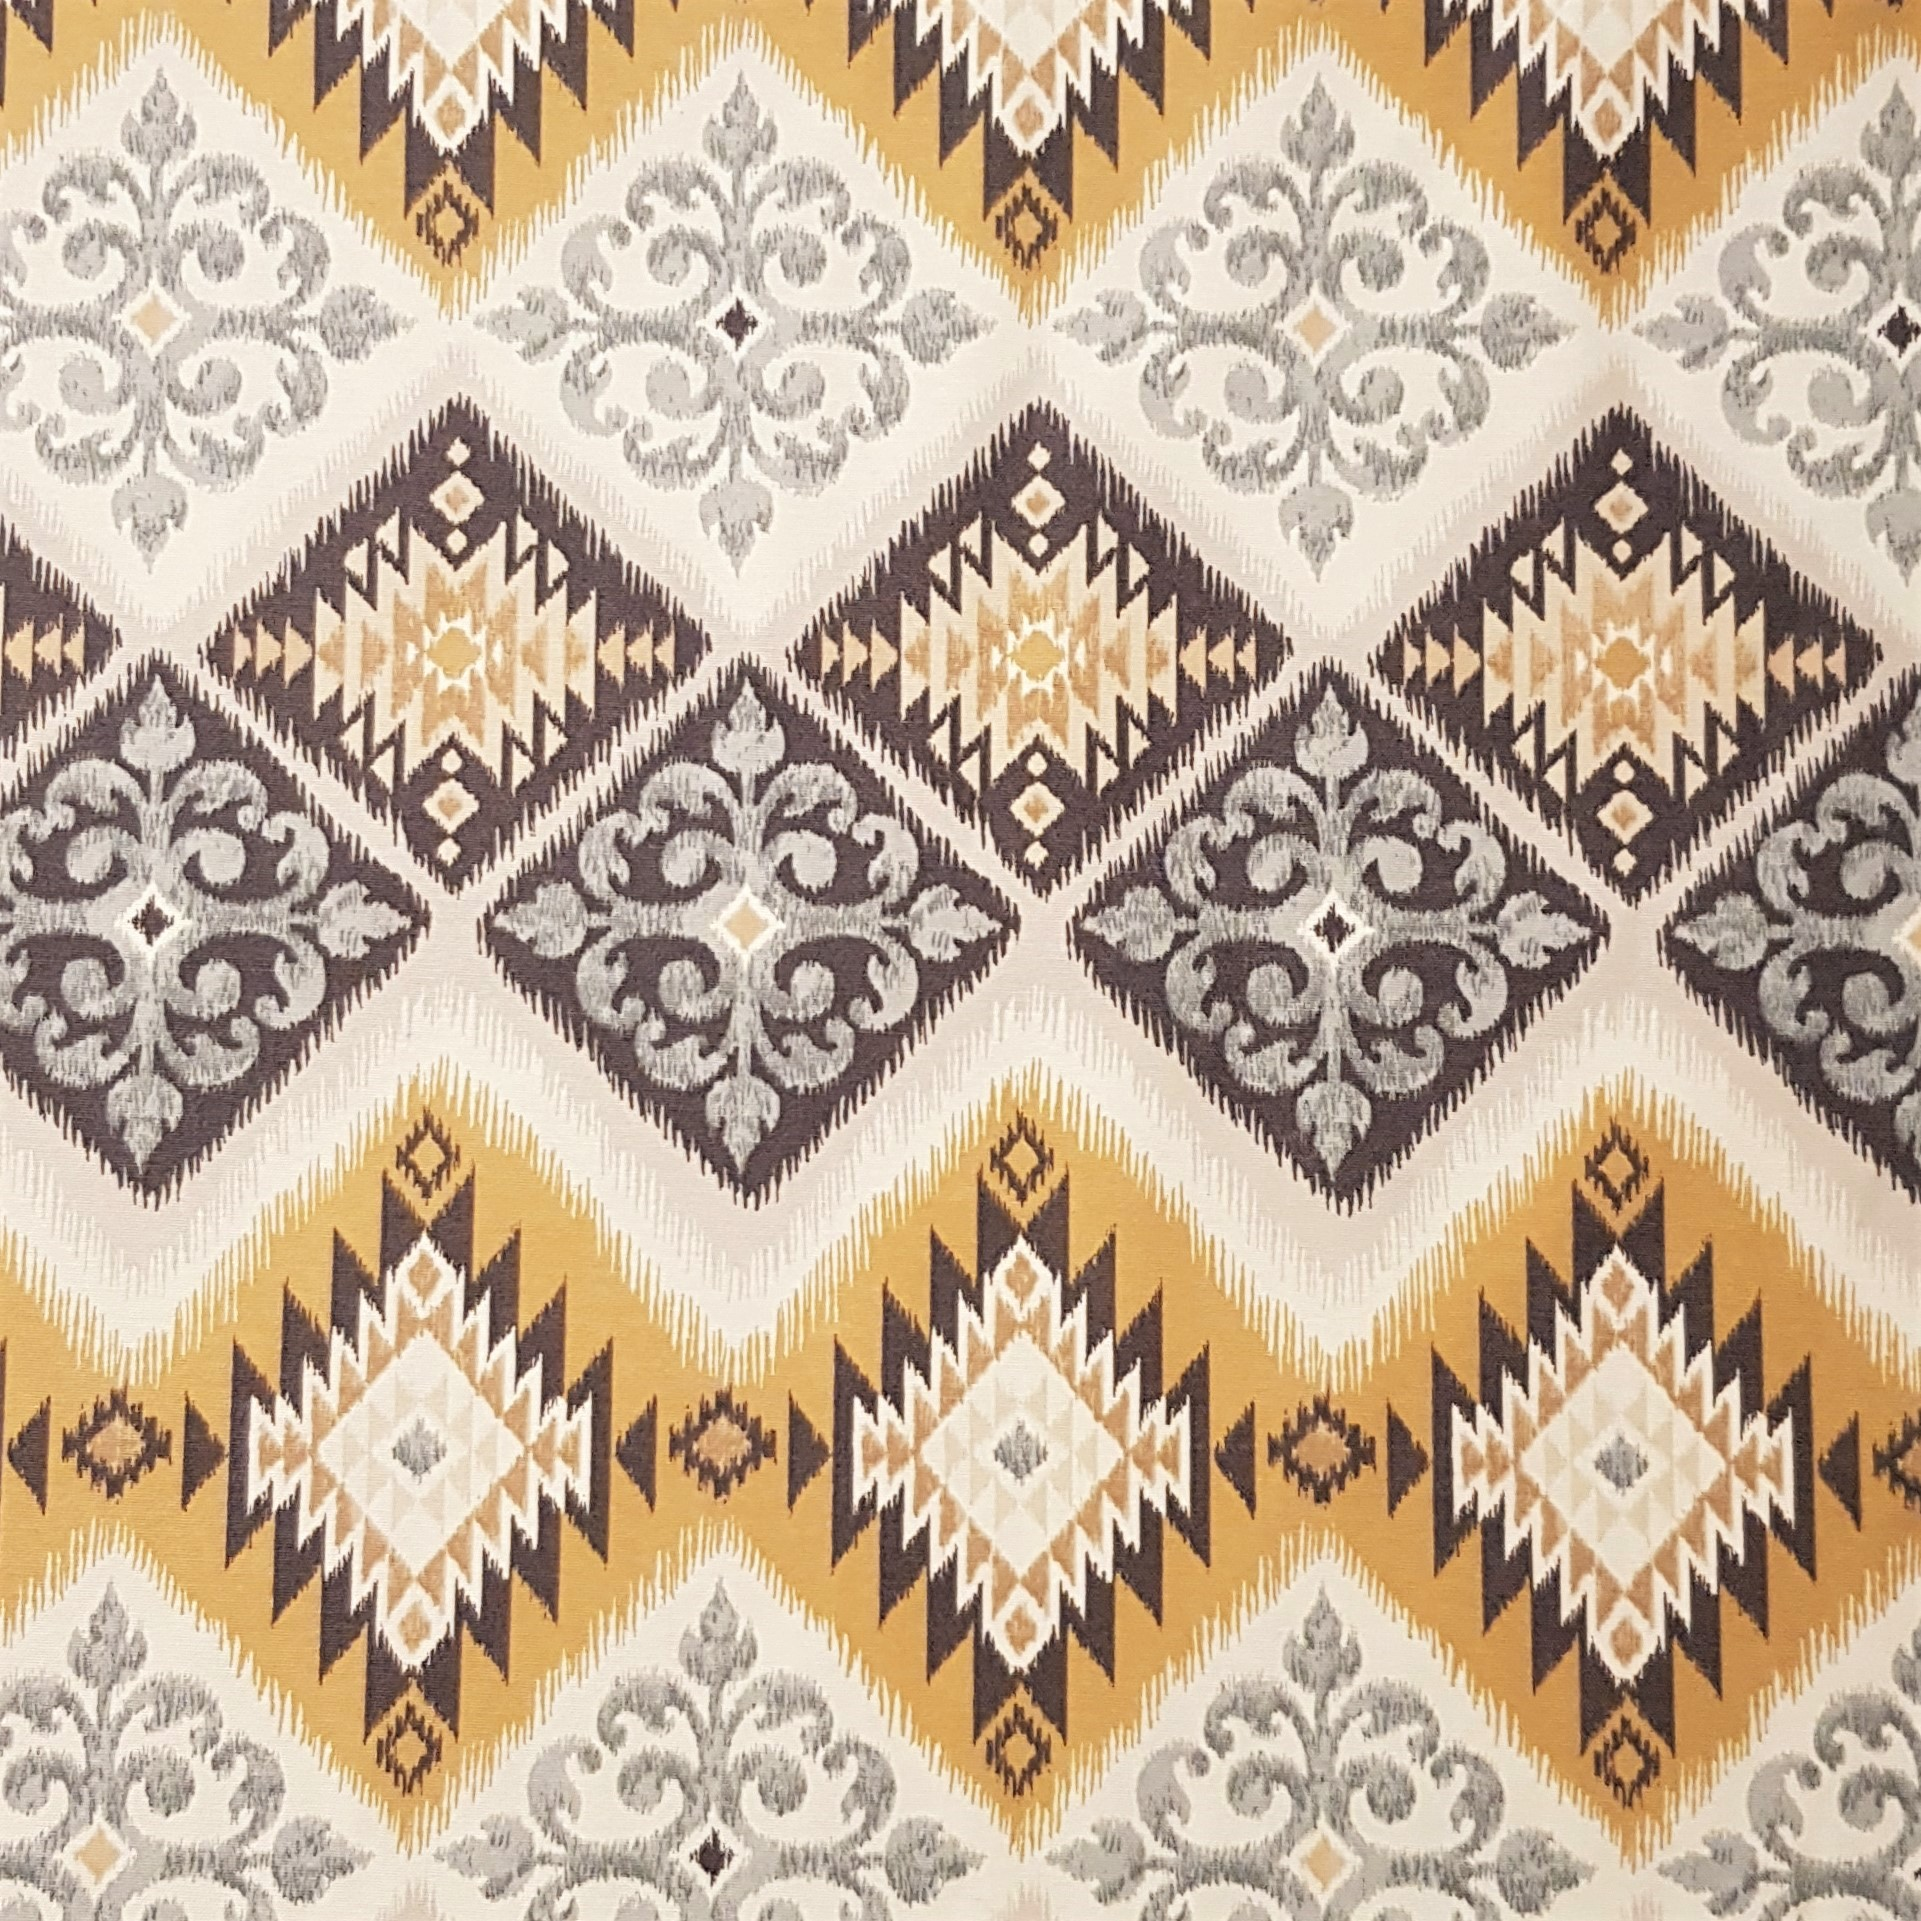 Mantel KILIM GRIS Rectangular 1,8x2,7m [enstockpara envíooretiro]